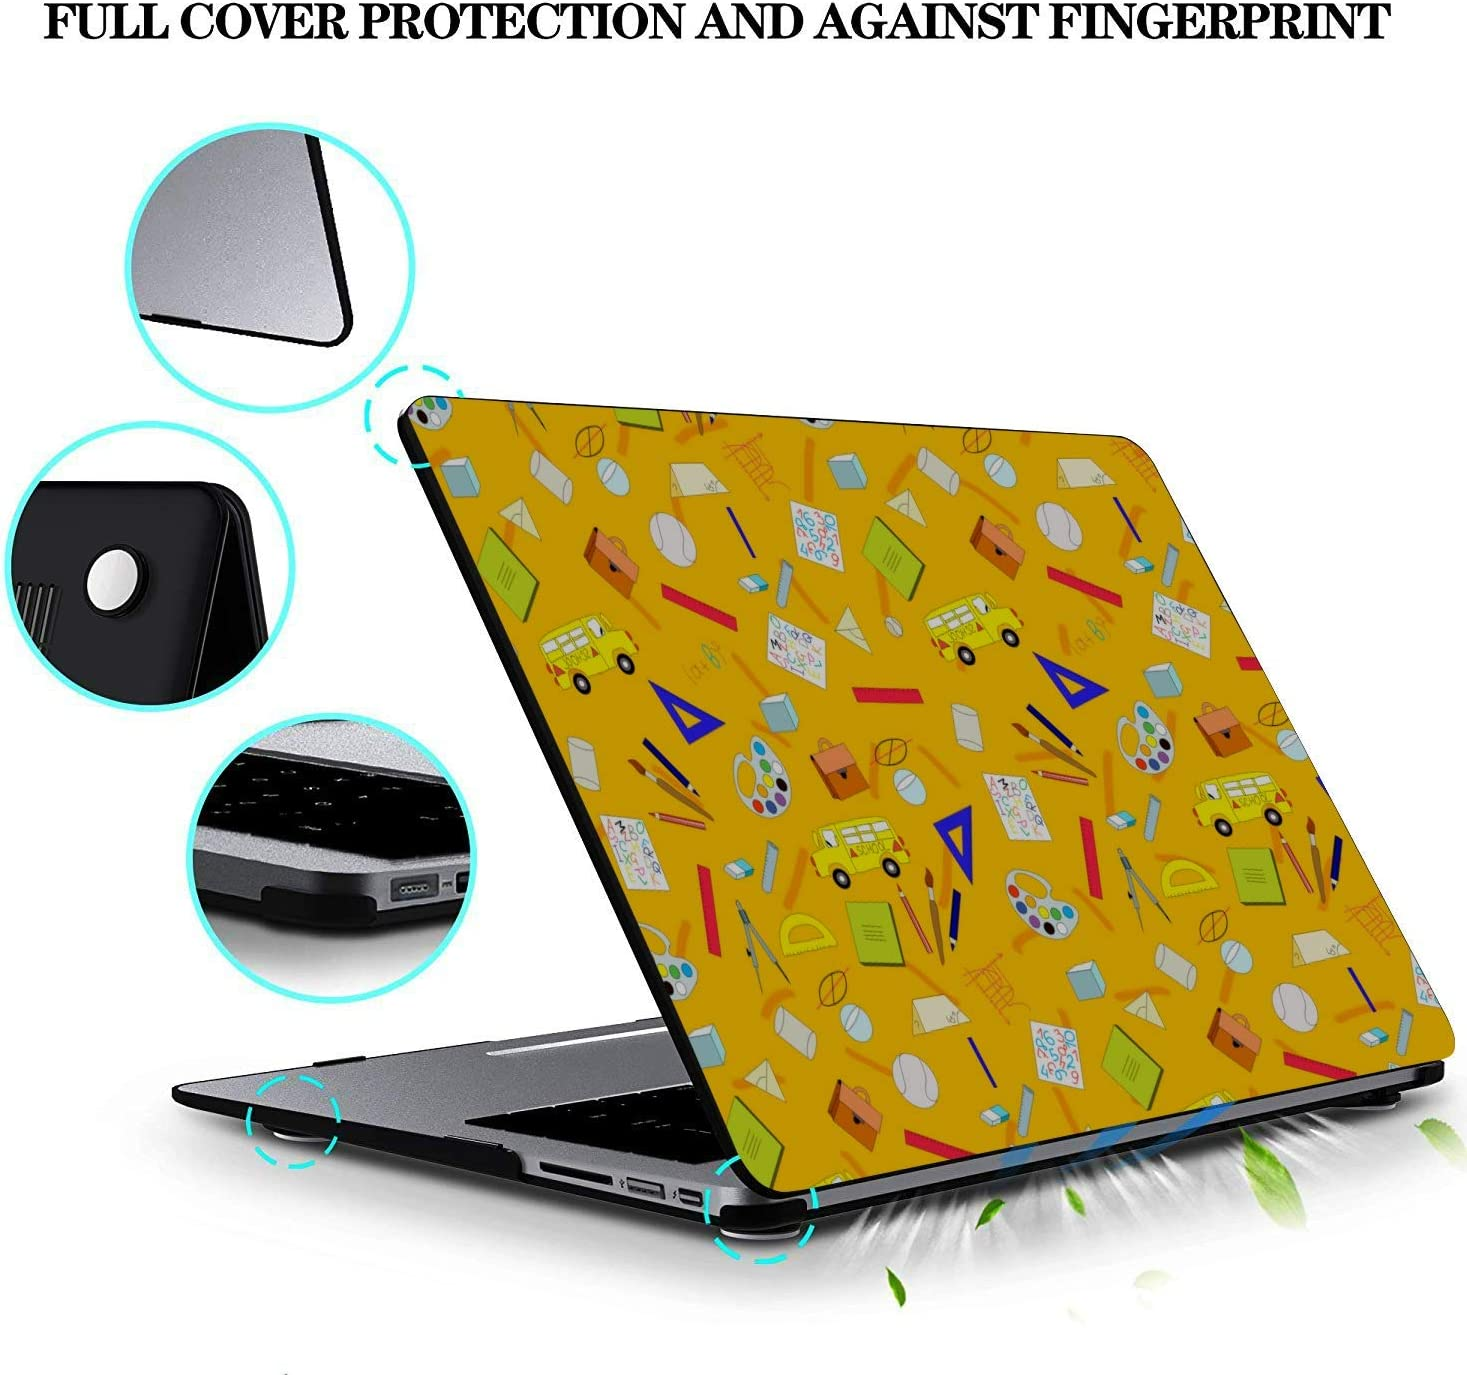 2018 MacBook Pro Accessories School Supplies Cute Stationery Bag Plastic Hard Shell Compatible Mac Air 11 Pro 13 15 MacBook Air Accessories Protection for MacBook 2016-2019 Version